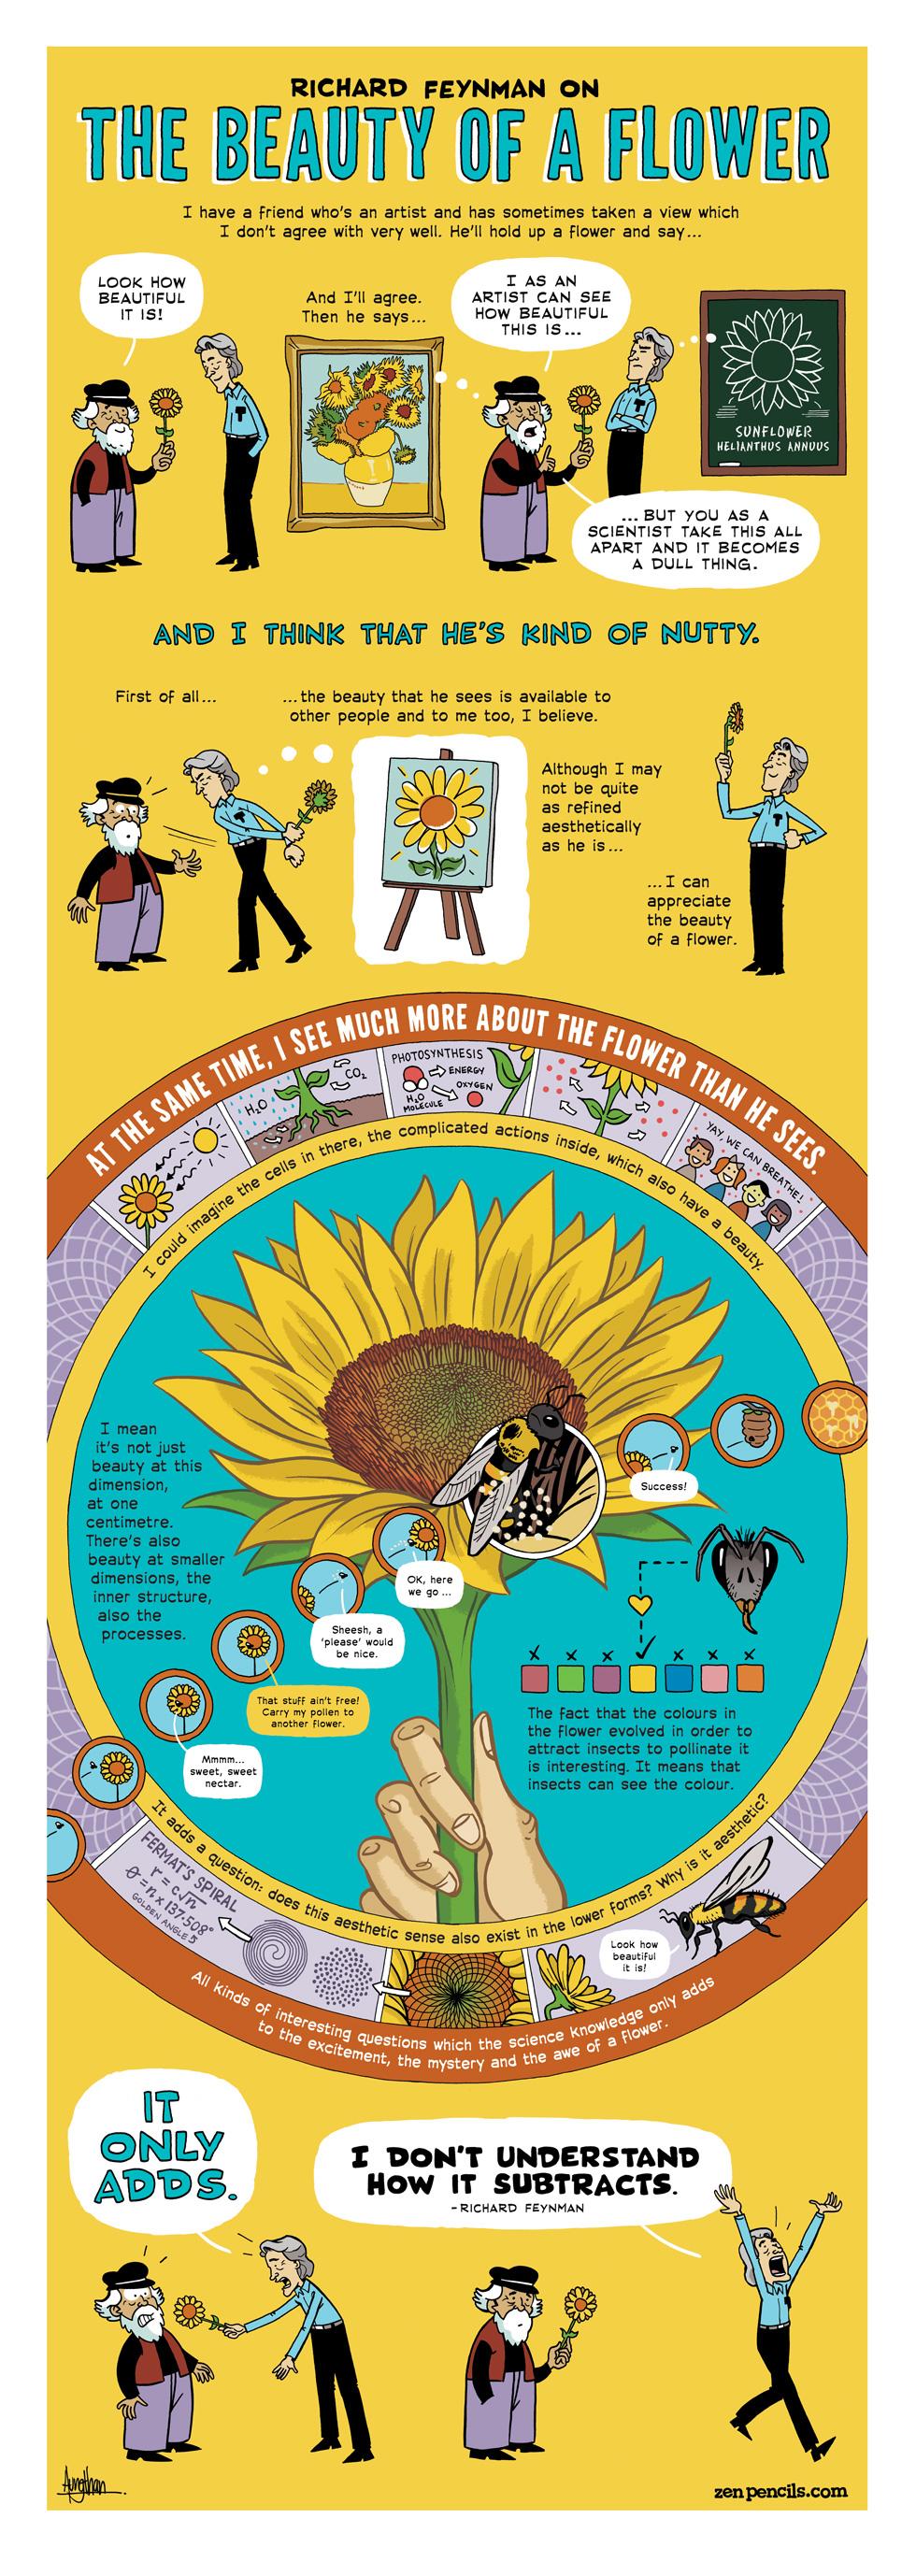 Comic de Zen Pencils con la Oda a una flor de Richard Feynman